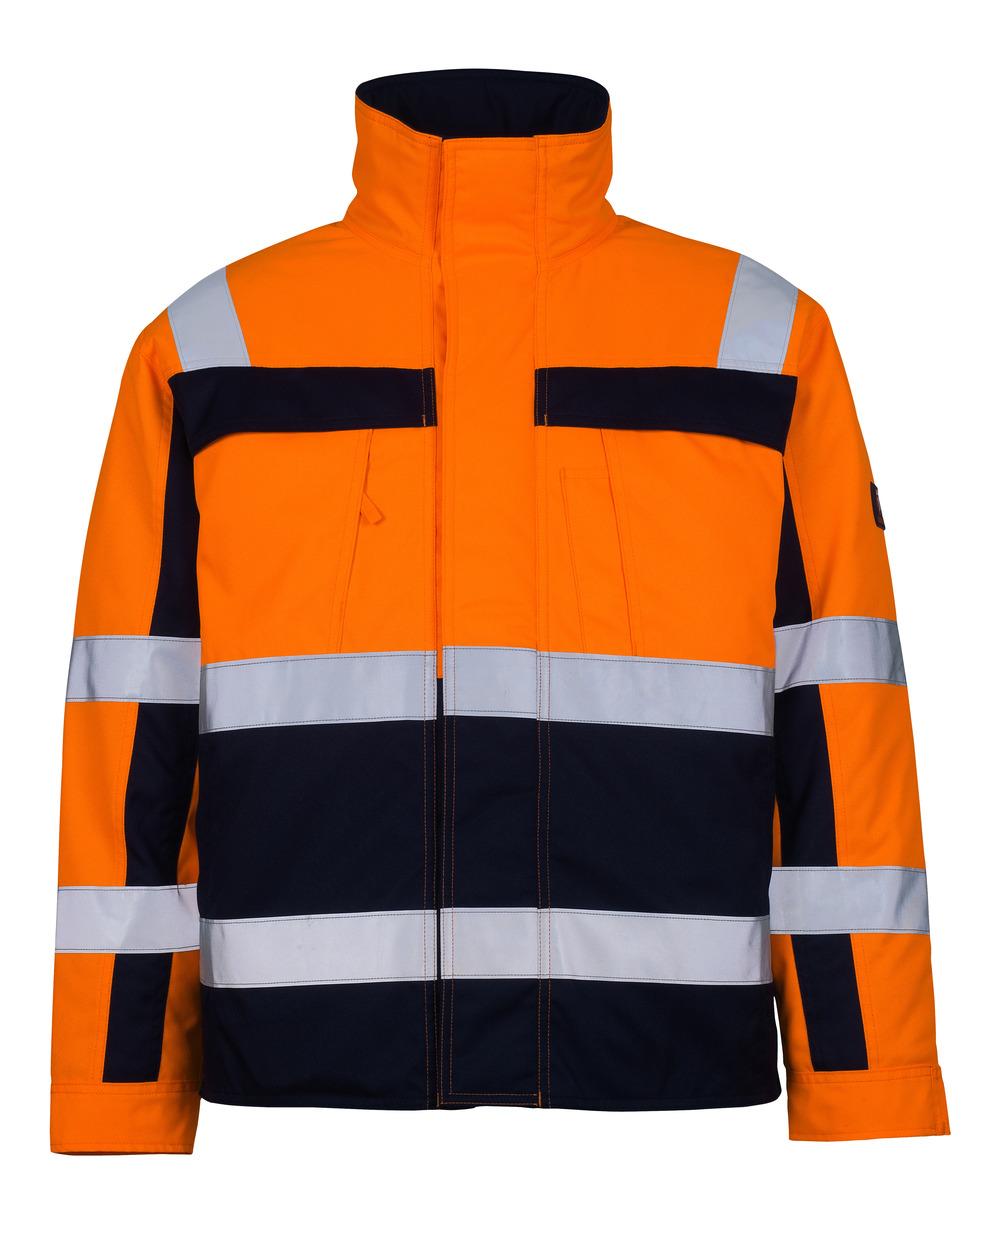 07123-126-141 Pilot Jacket - hi-vis orange/navy